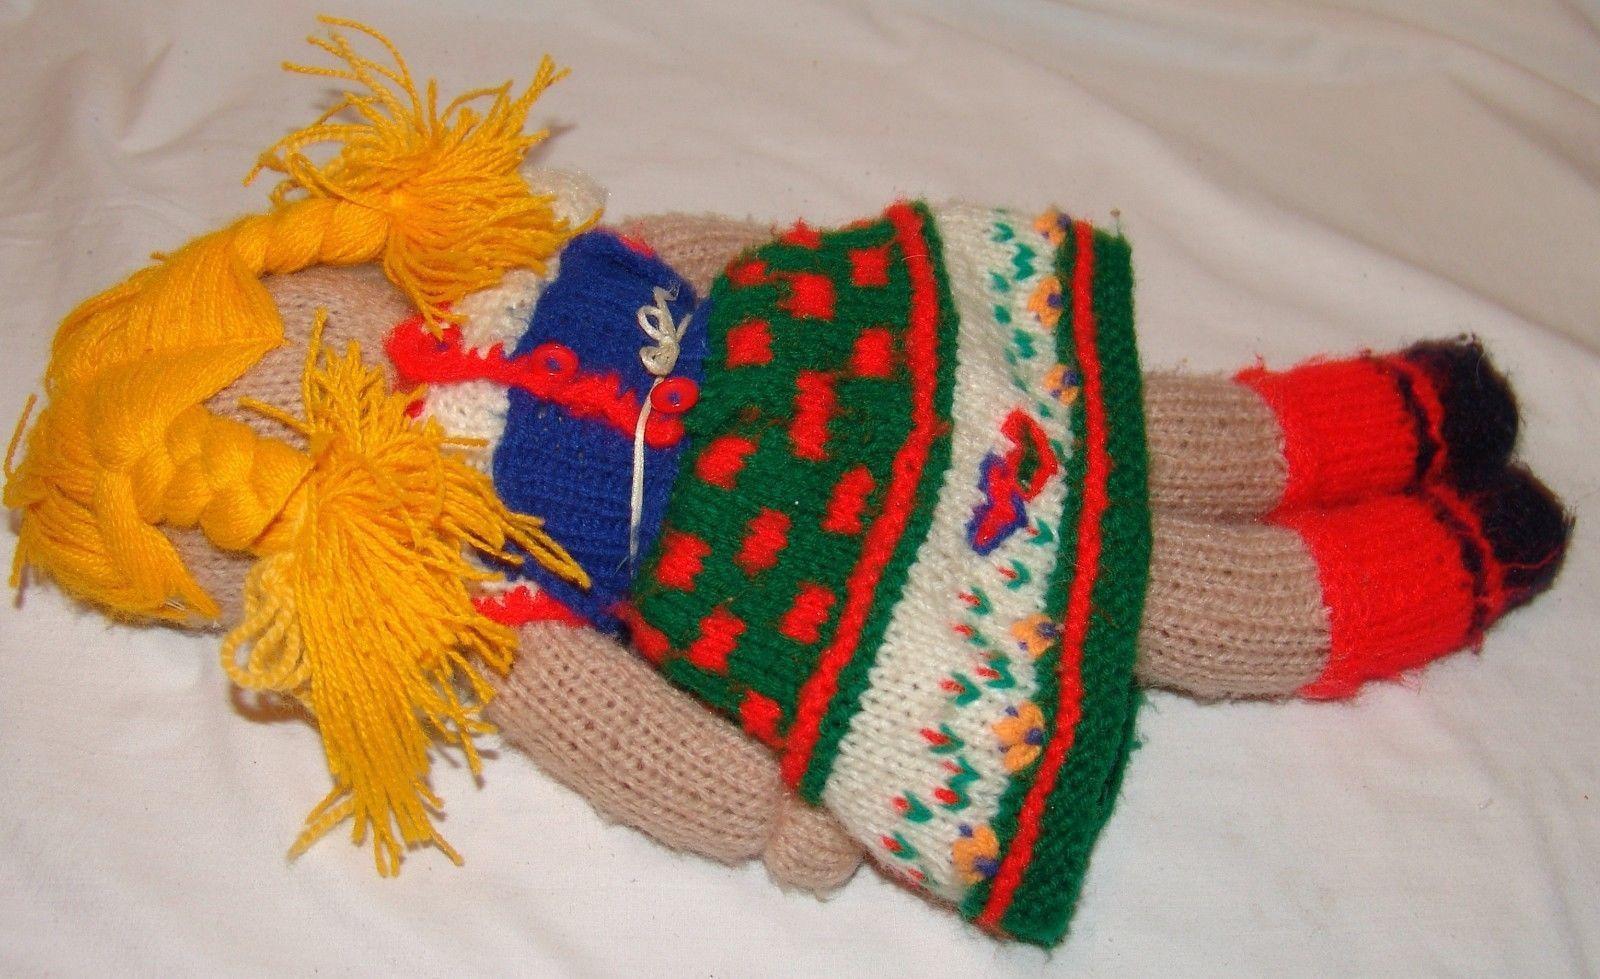 "Vtg Rag Doll Handmade Yarn Crochet Crocheted Knit 17"" Toy Baby"